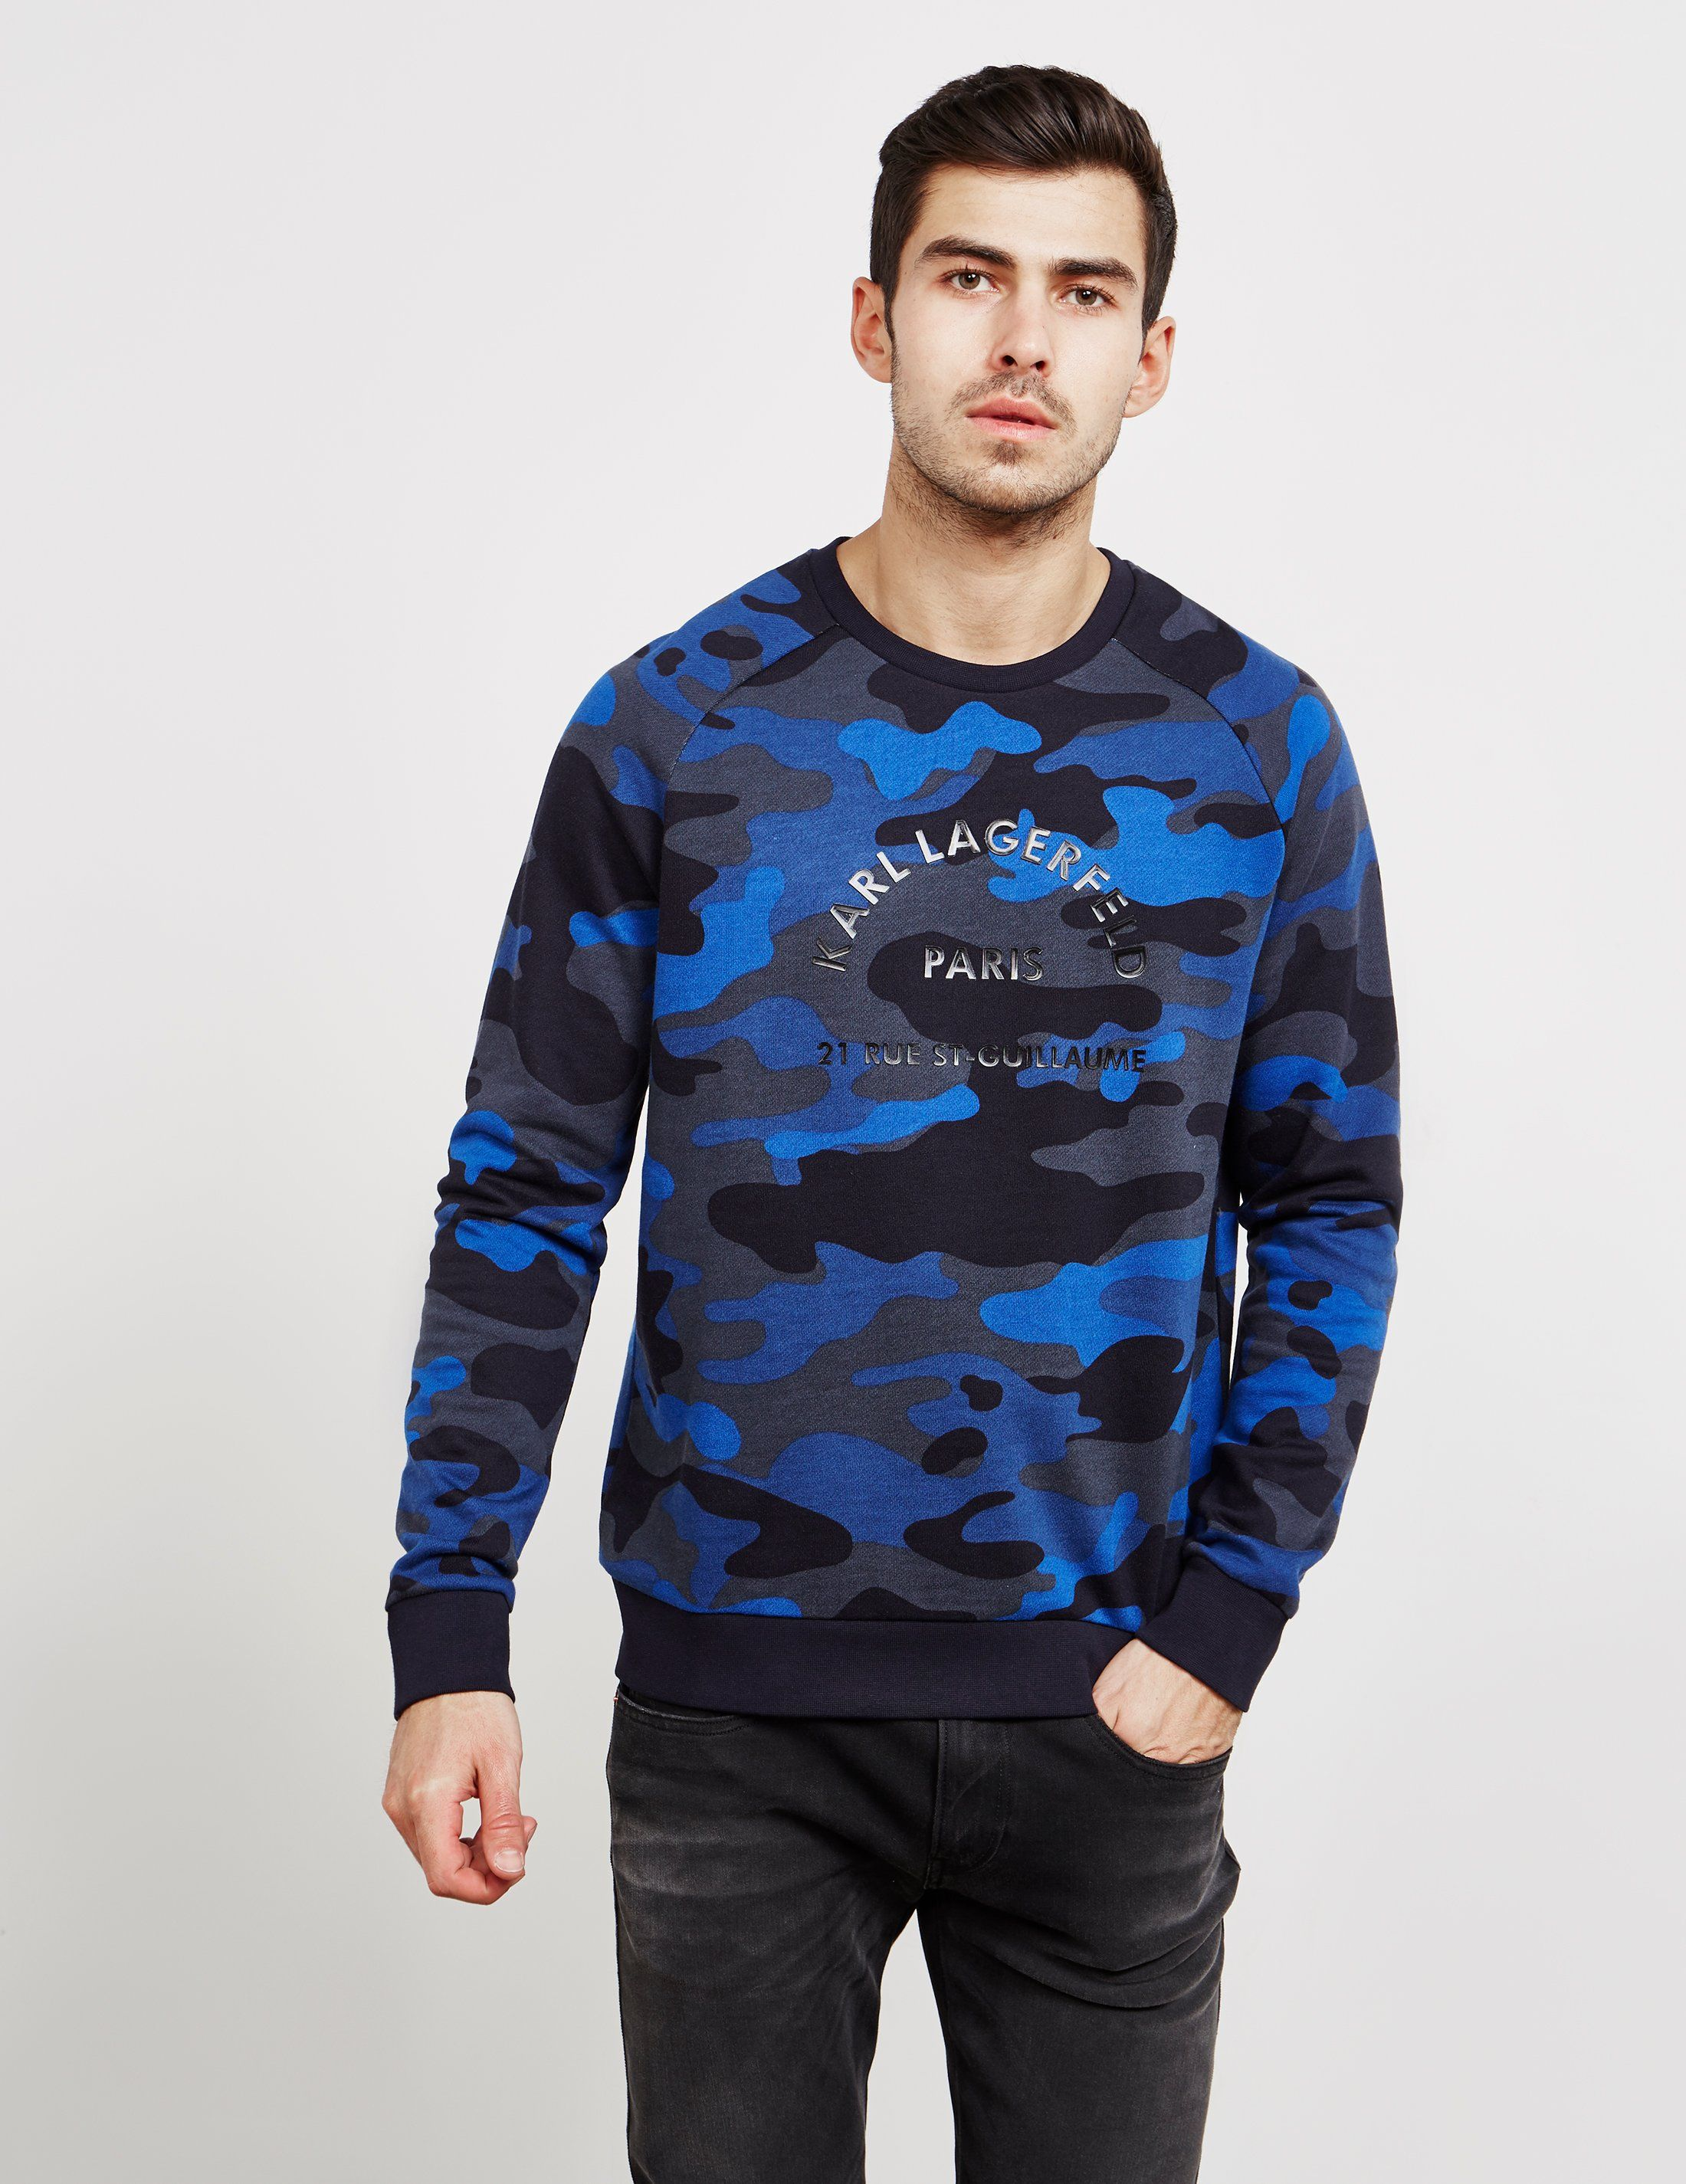 Karl Lagerfeld Camouflage Sweatshirt